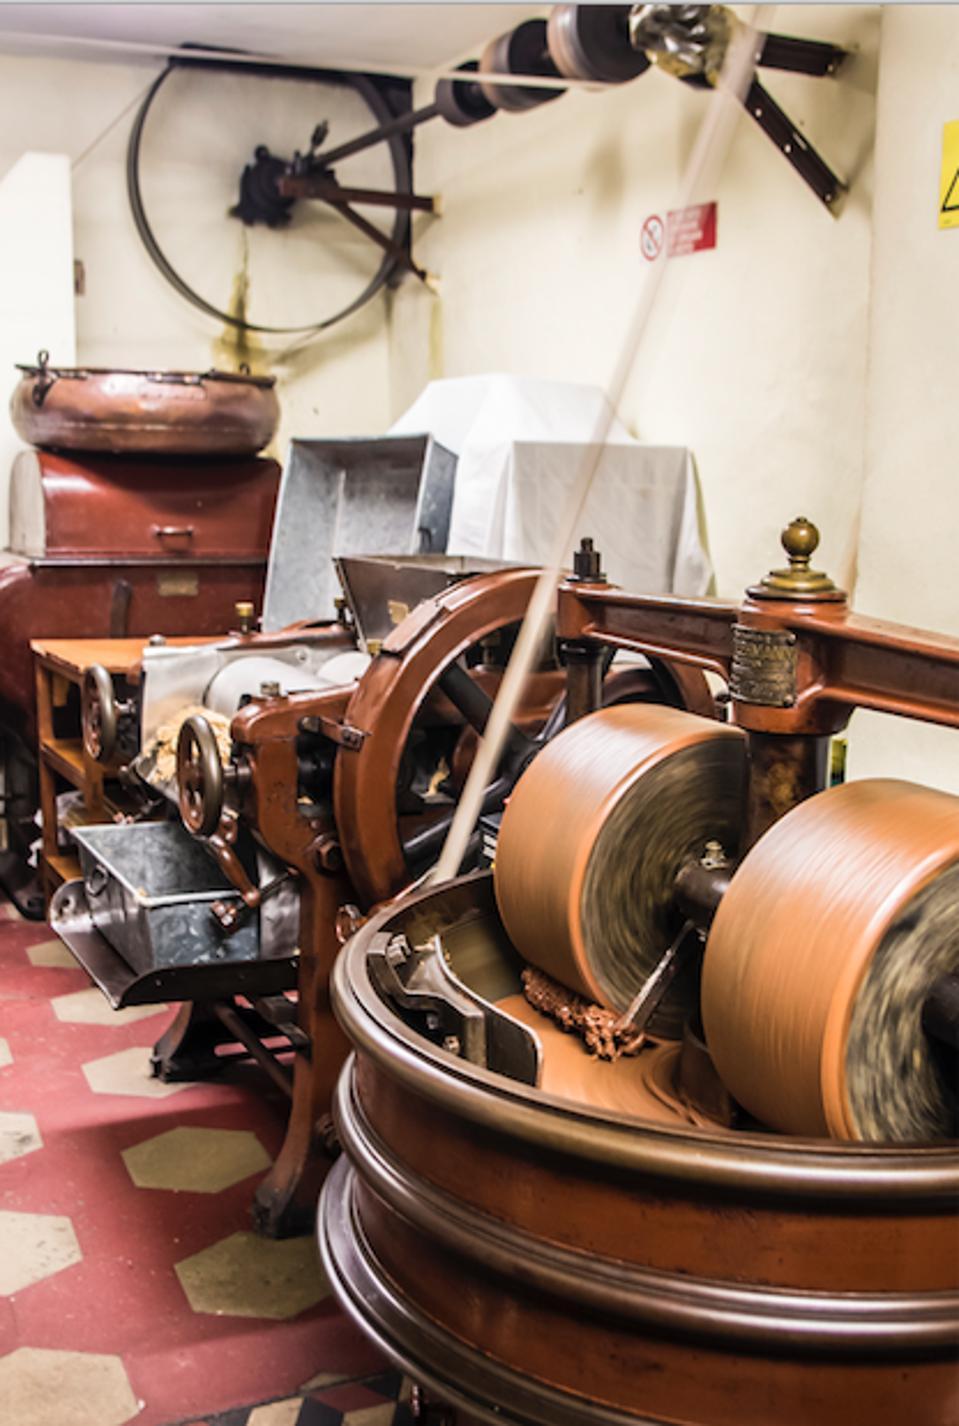 Vintage machinery.